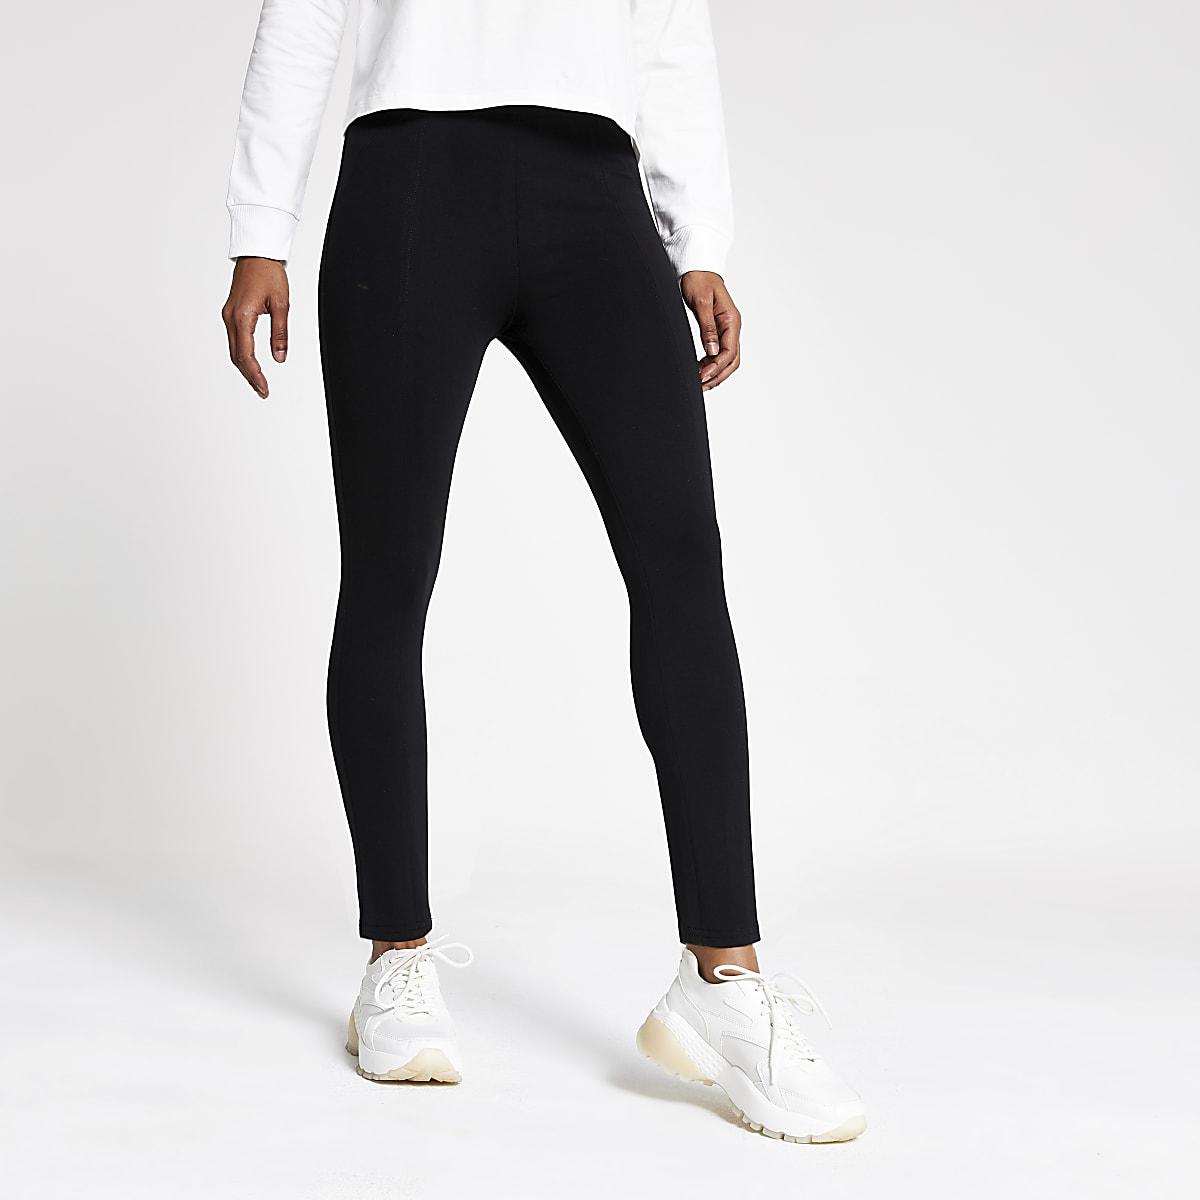 RI Petite- Zwarte legging met jersey panelen